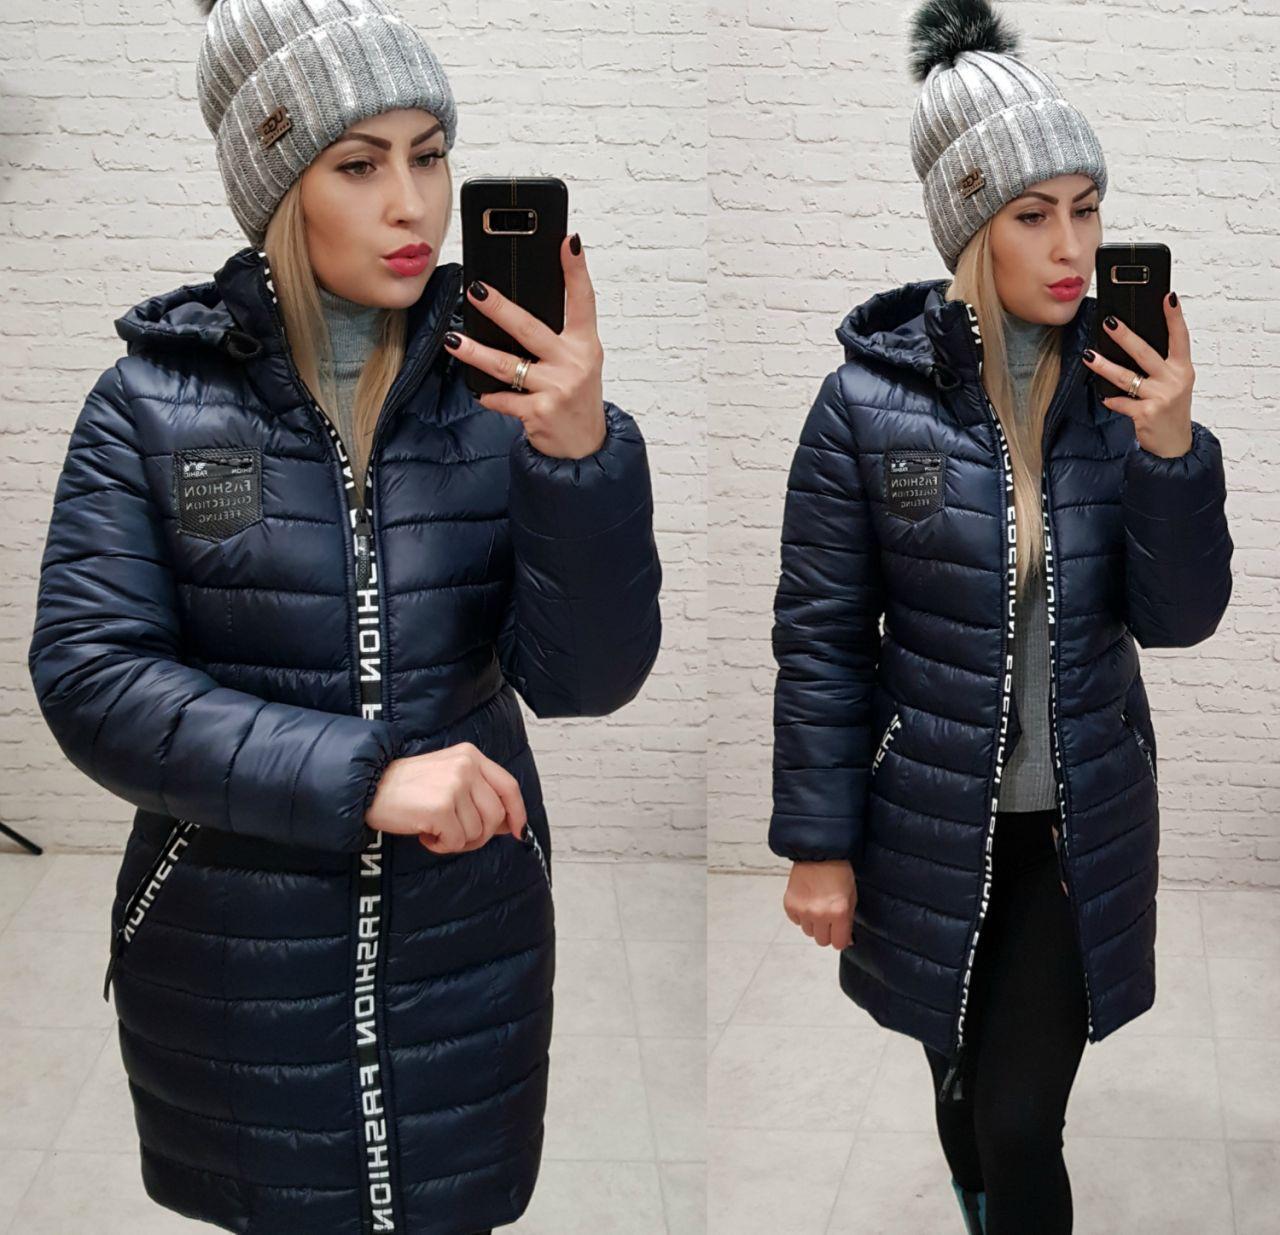 Куртка Зима, модель 212/2, цвет - темно синий глянцевый